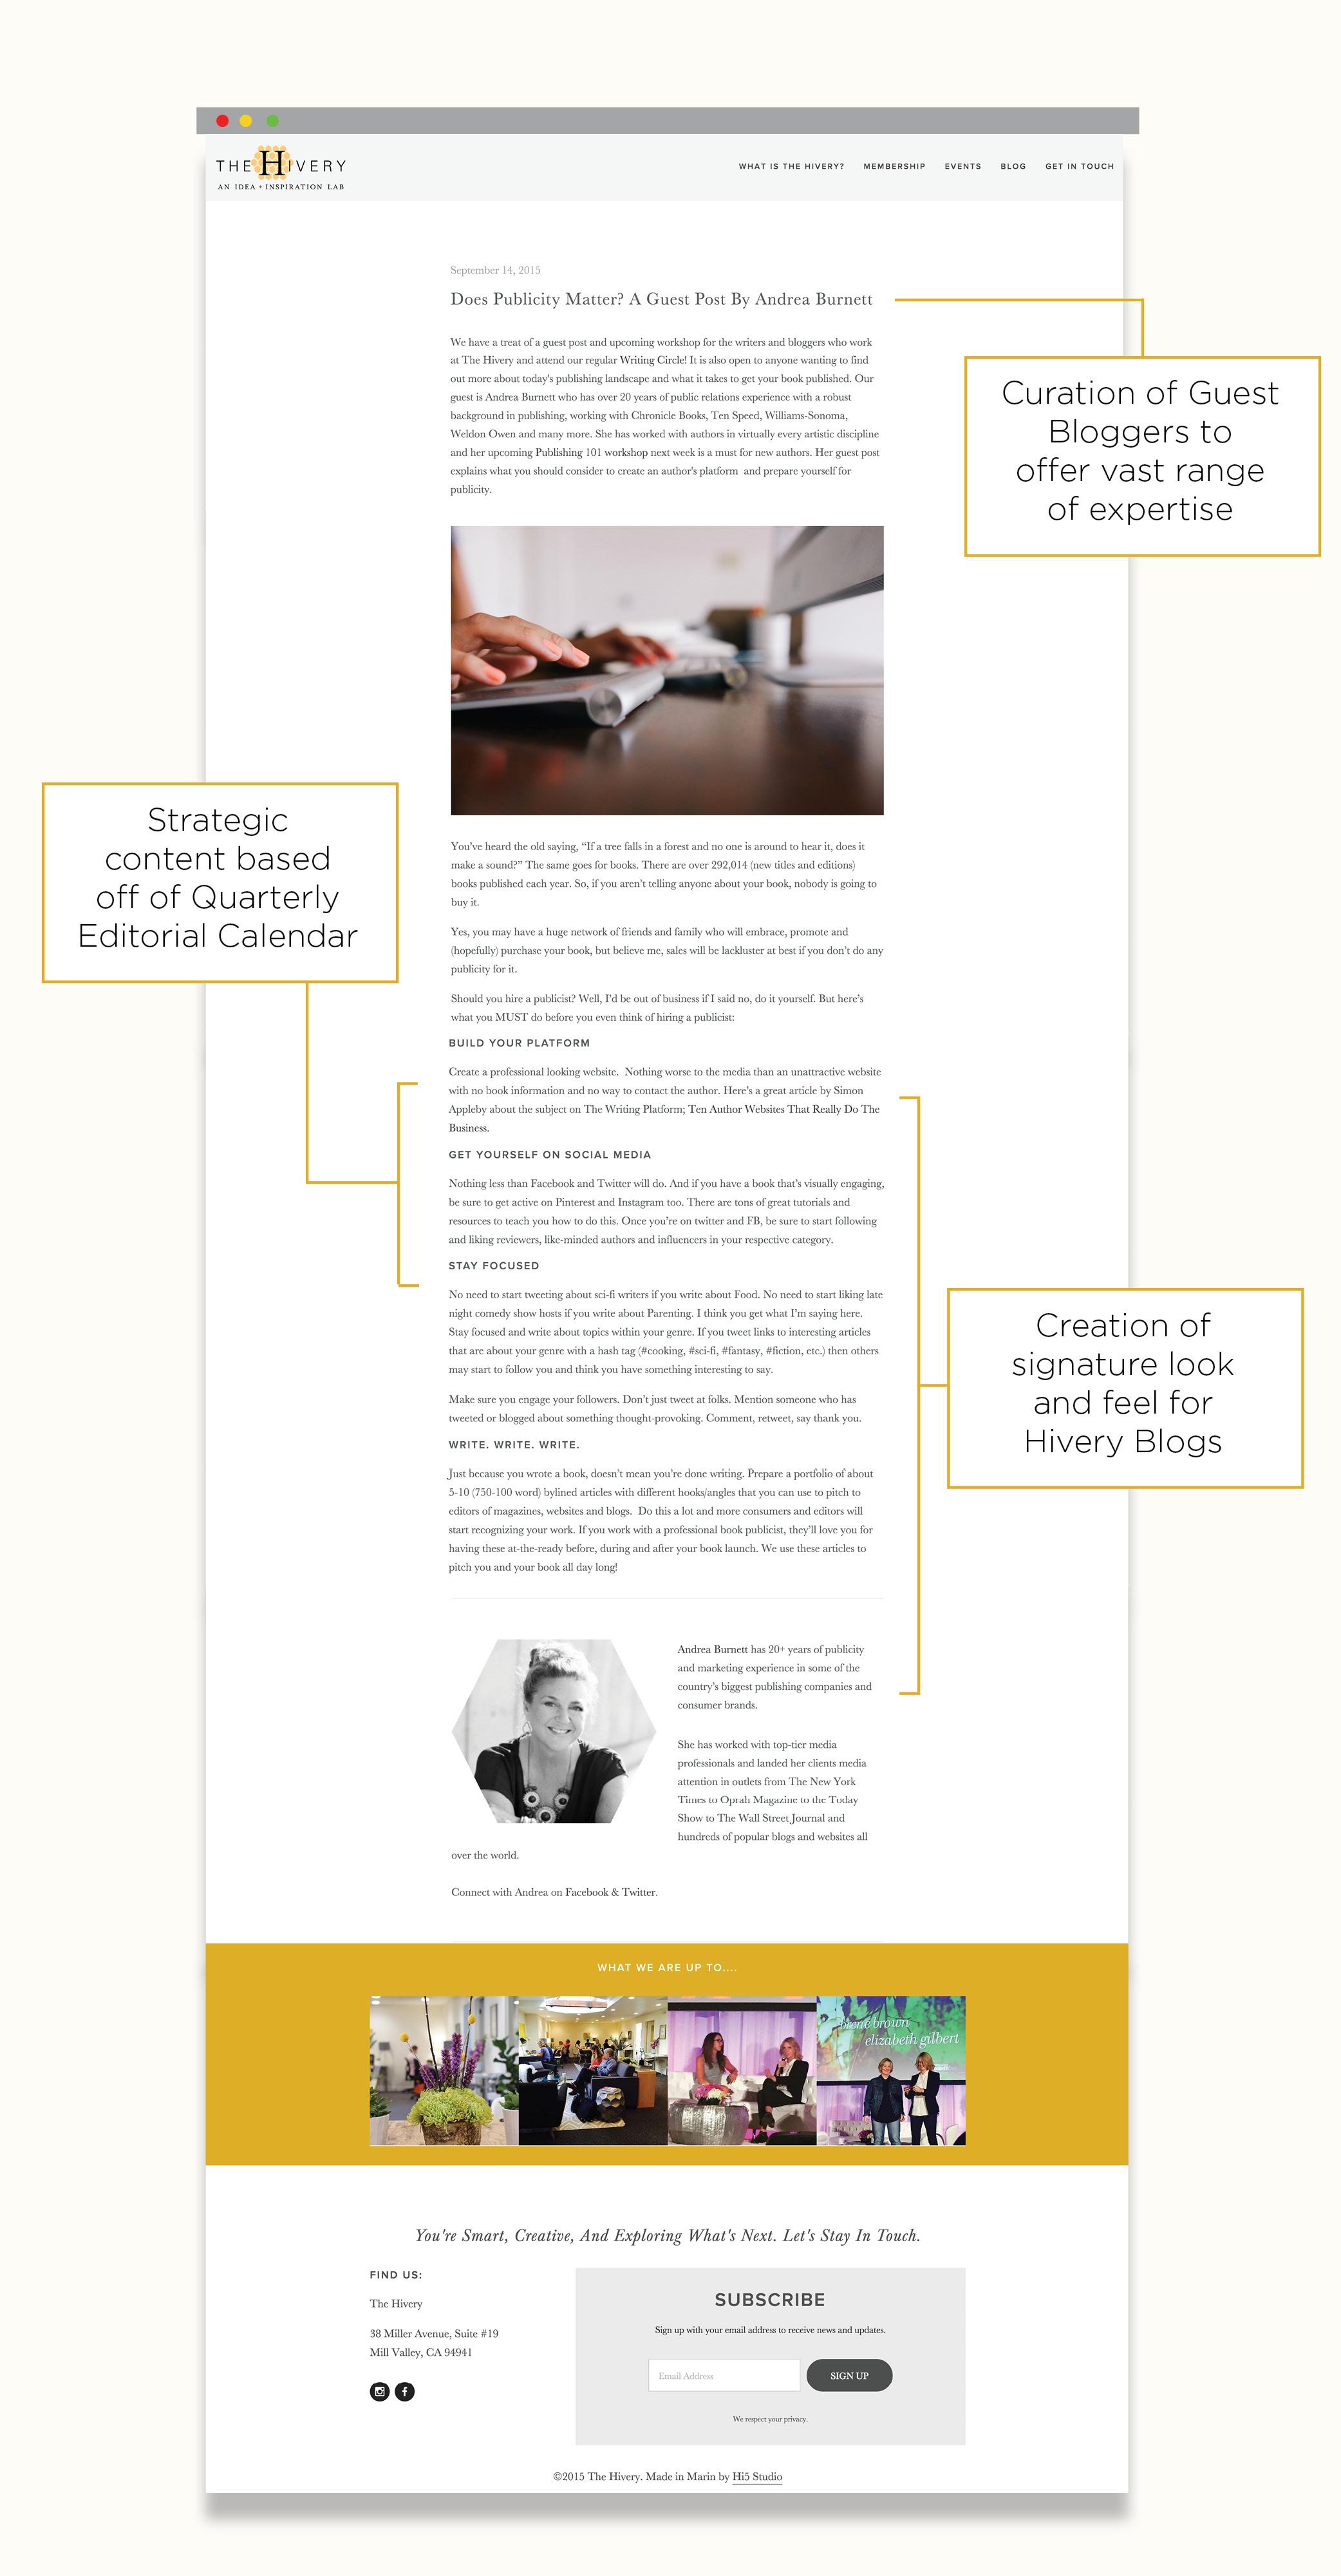 Primd Marketing - Case Study - The Hivery